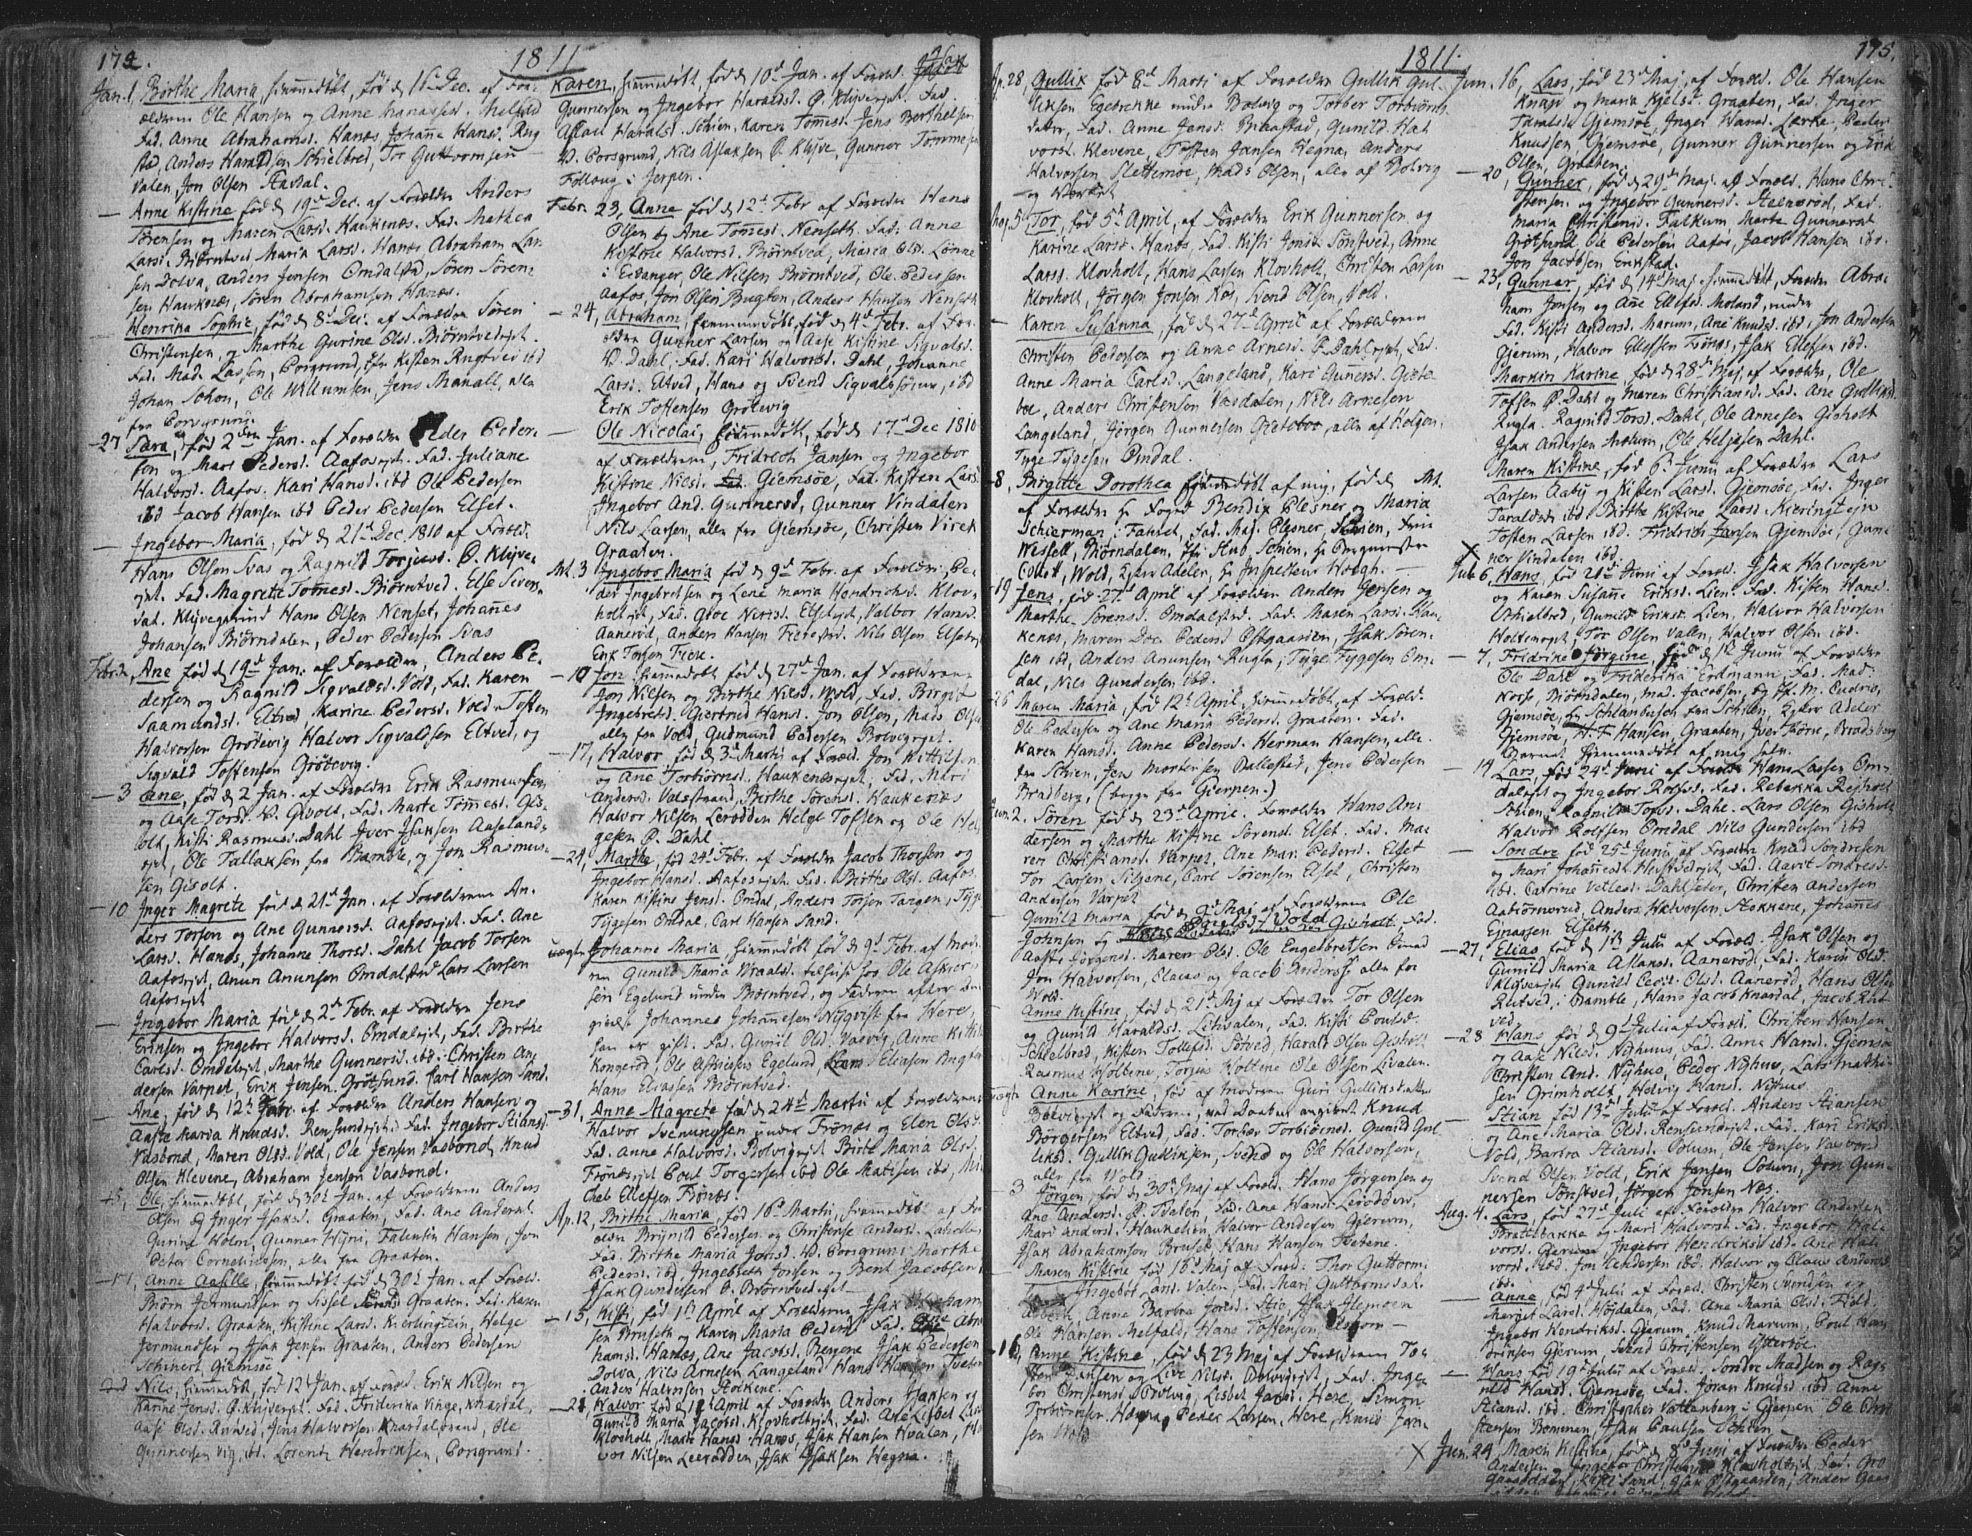 SAKO, Solum kirkebøker, F/Fa/L0003: Ministerialbok nr. I 3, 1761-1814, s. 174-175